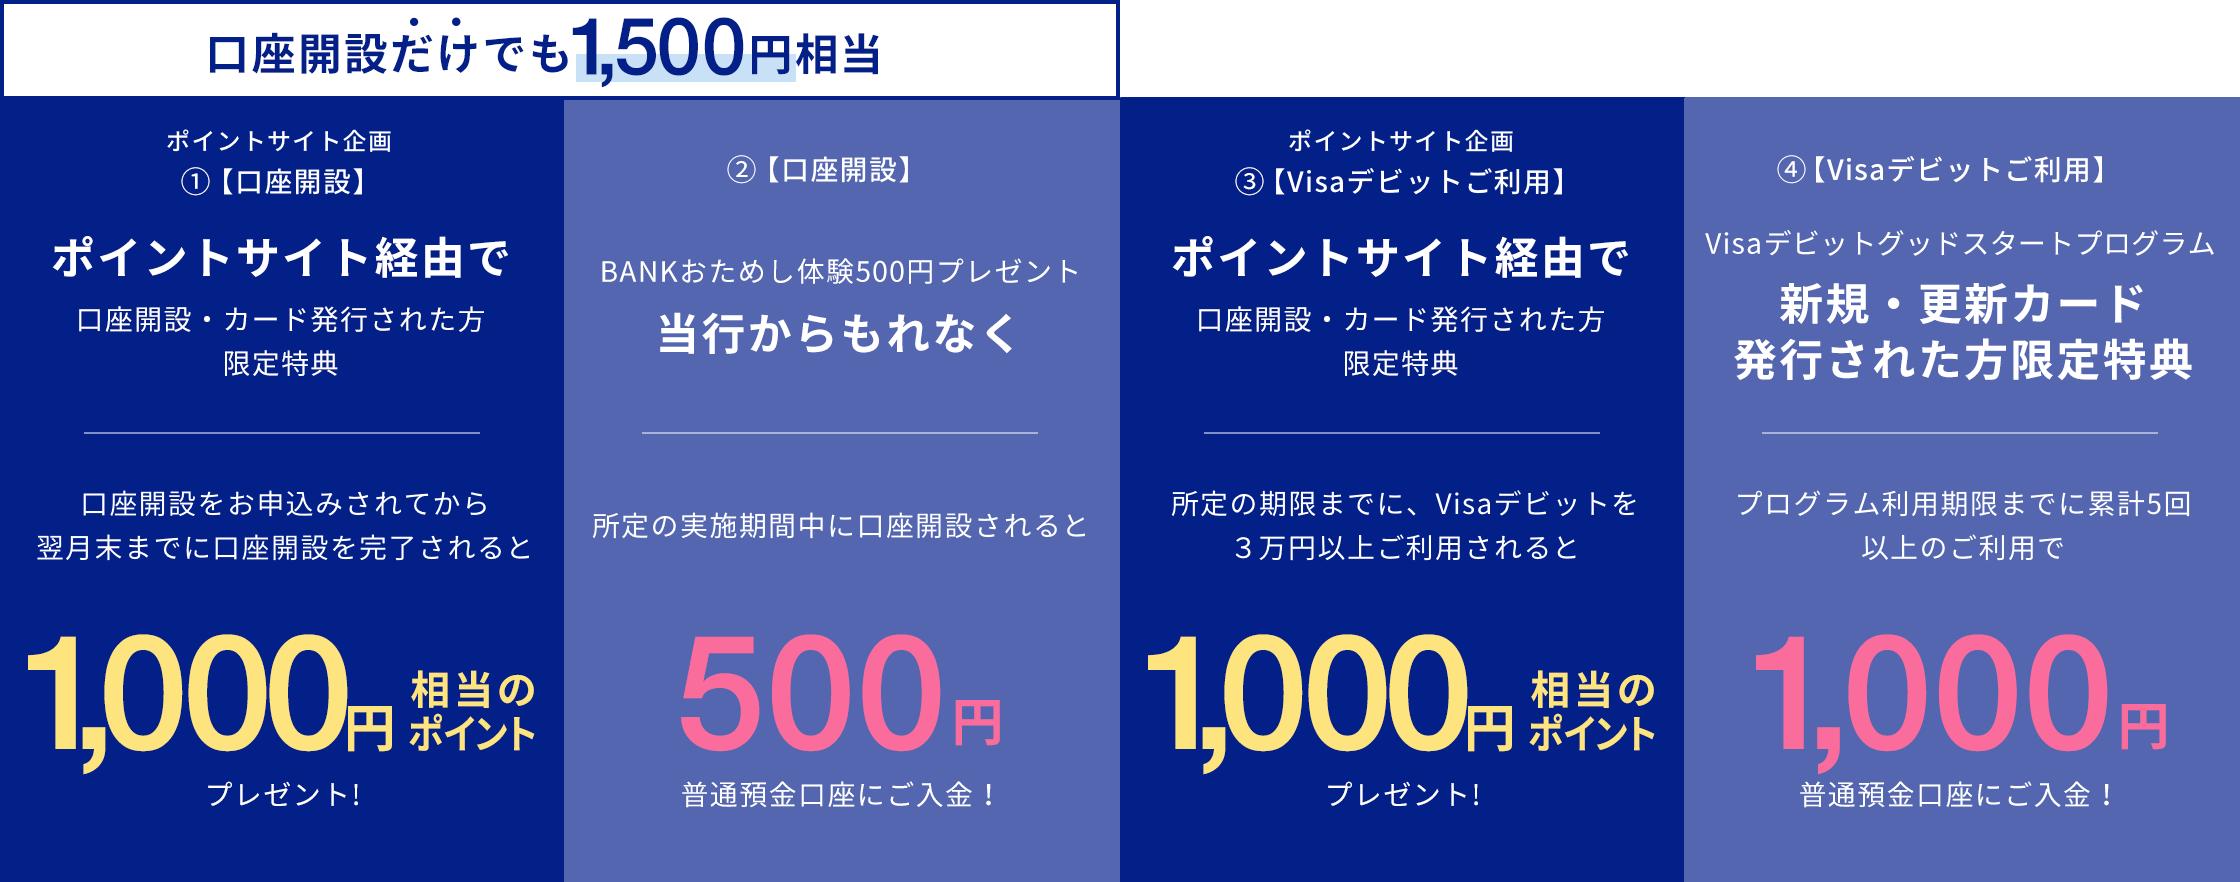 3,500円